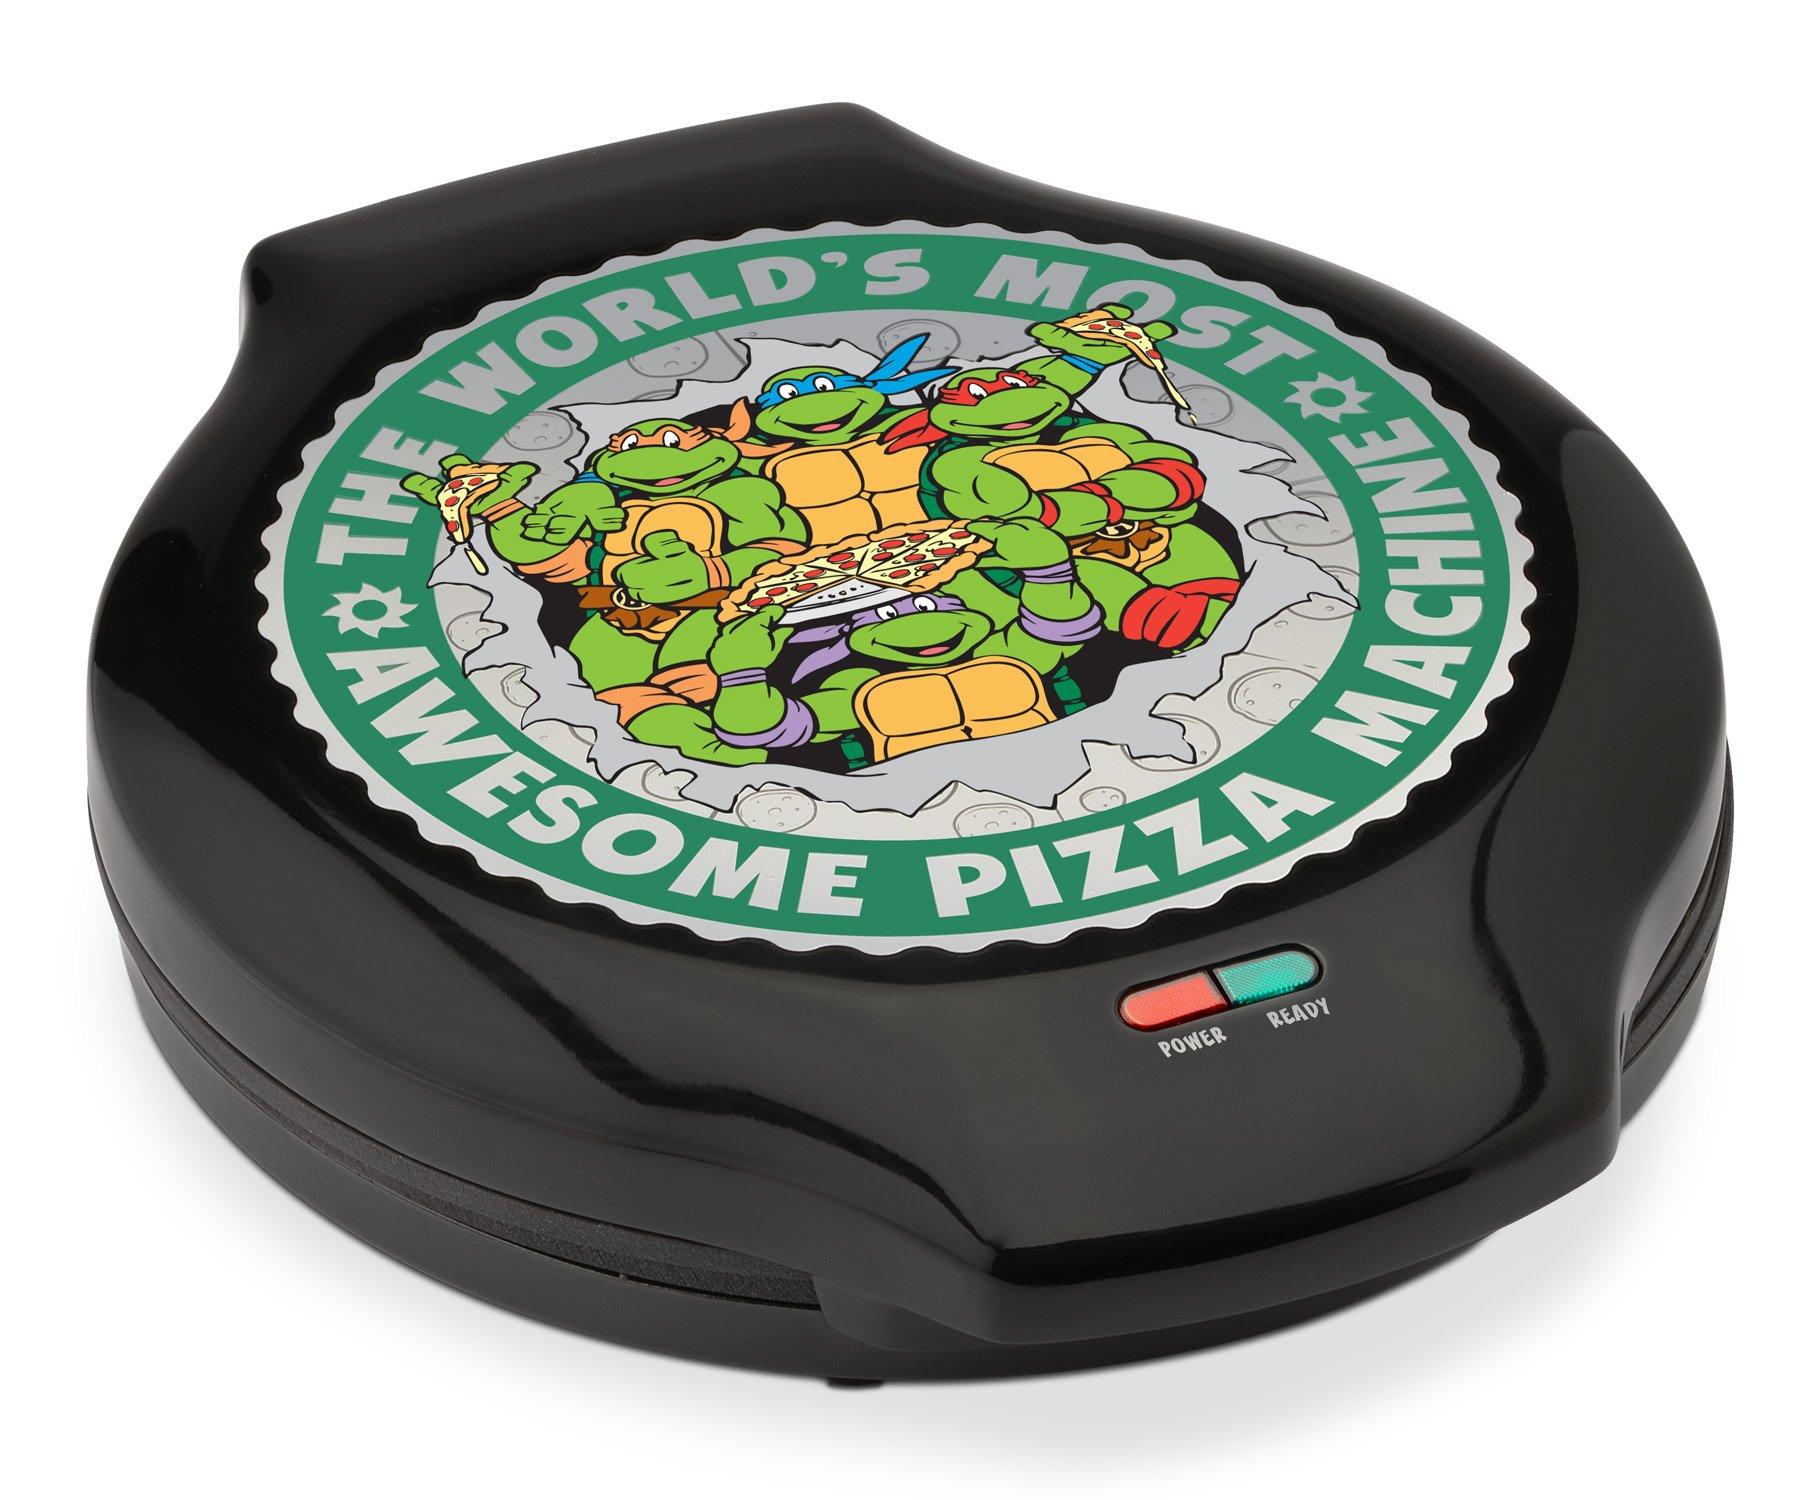 Nickelodeon NTPM-55 Teenage Mutant Ninja Turtles Pizza Maker, Green by Nickelodeon